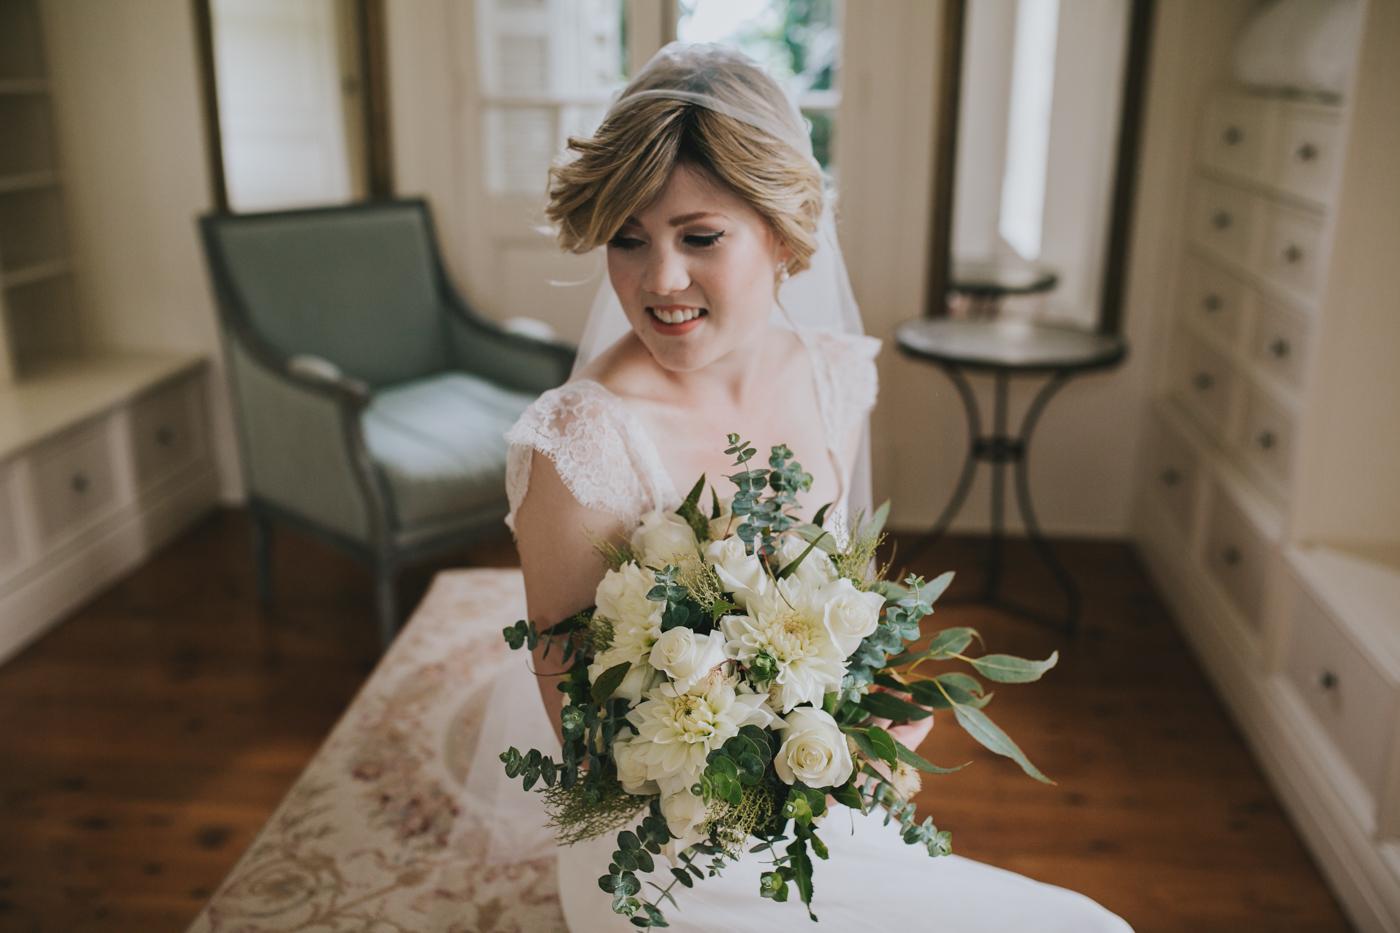 Rachel & Jacob - Willow Farm Berry - South Coast Wedding - Samantha Heather Photography-39.jpg